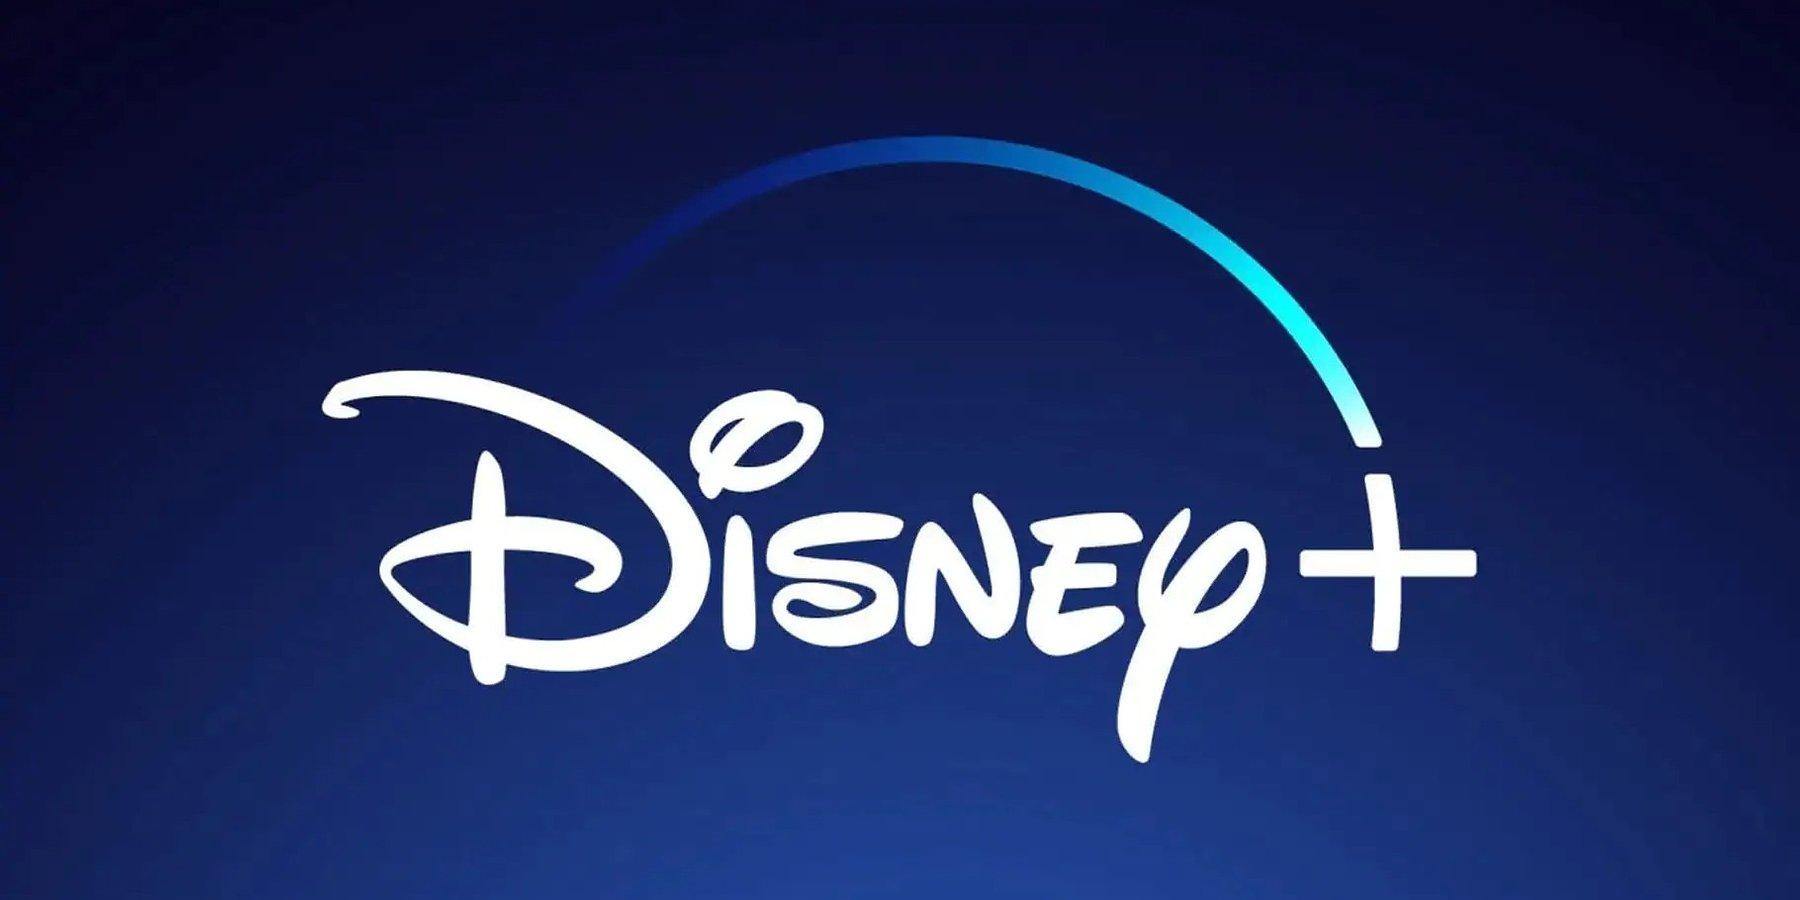 Mulan tem estreia exclusiva no Disney+ a 4 de dezembro